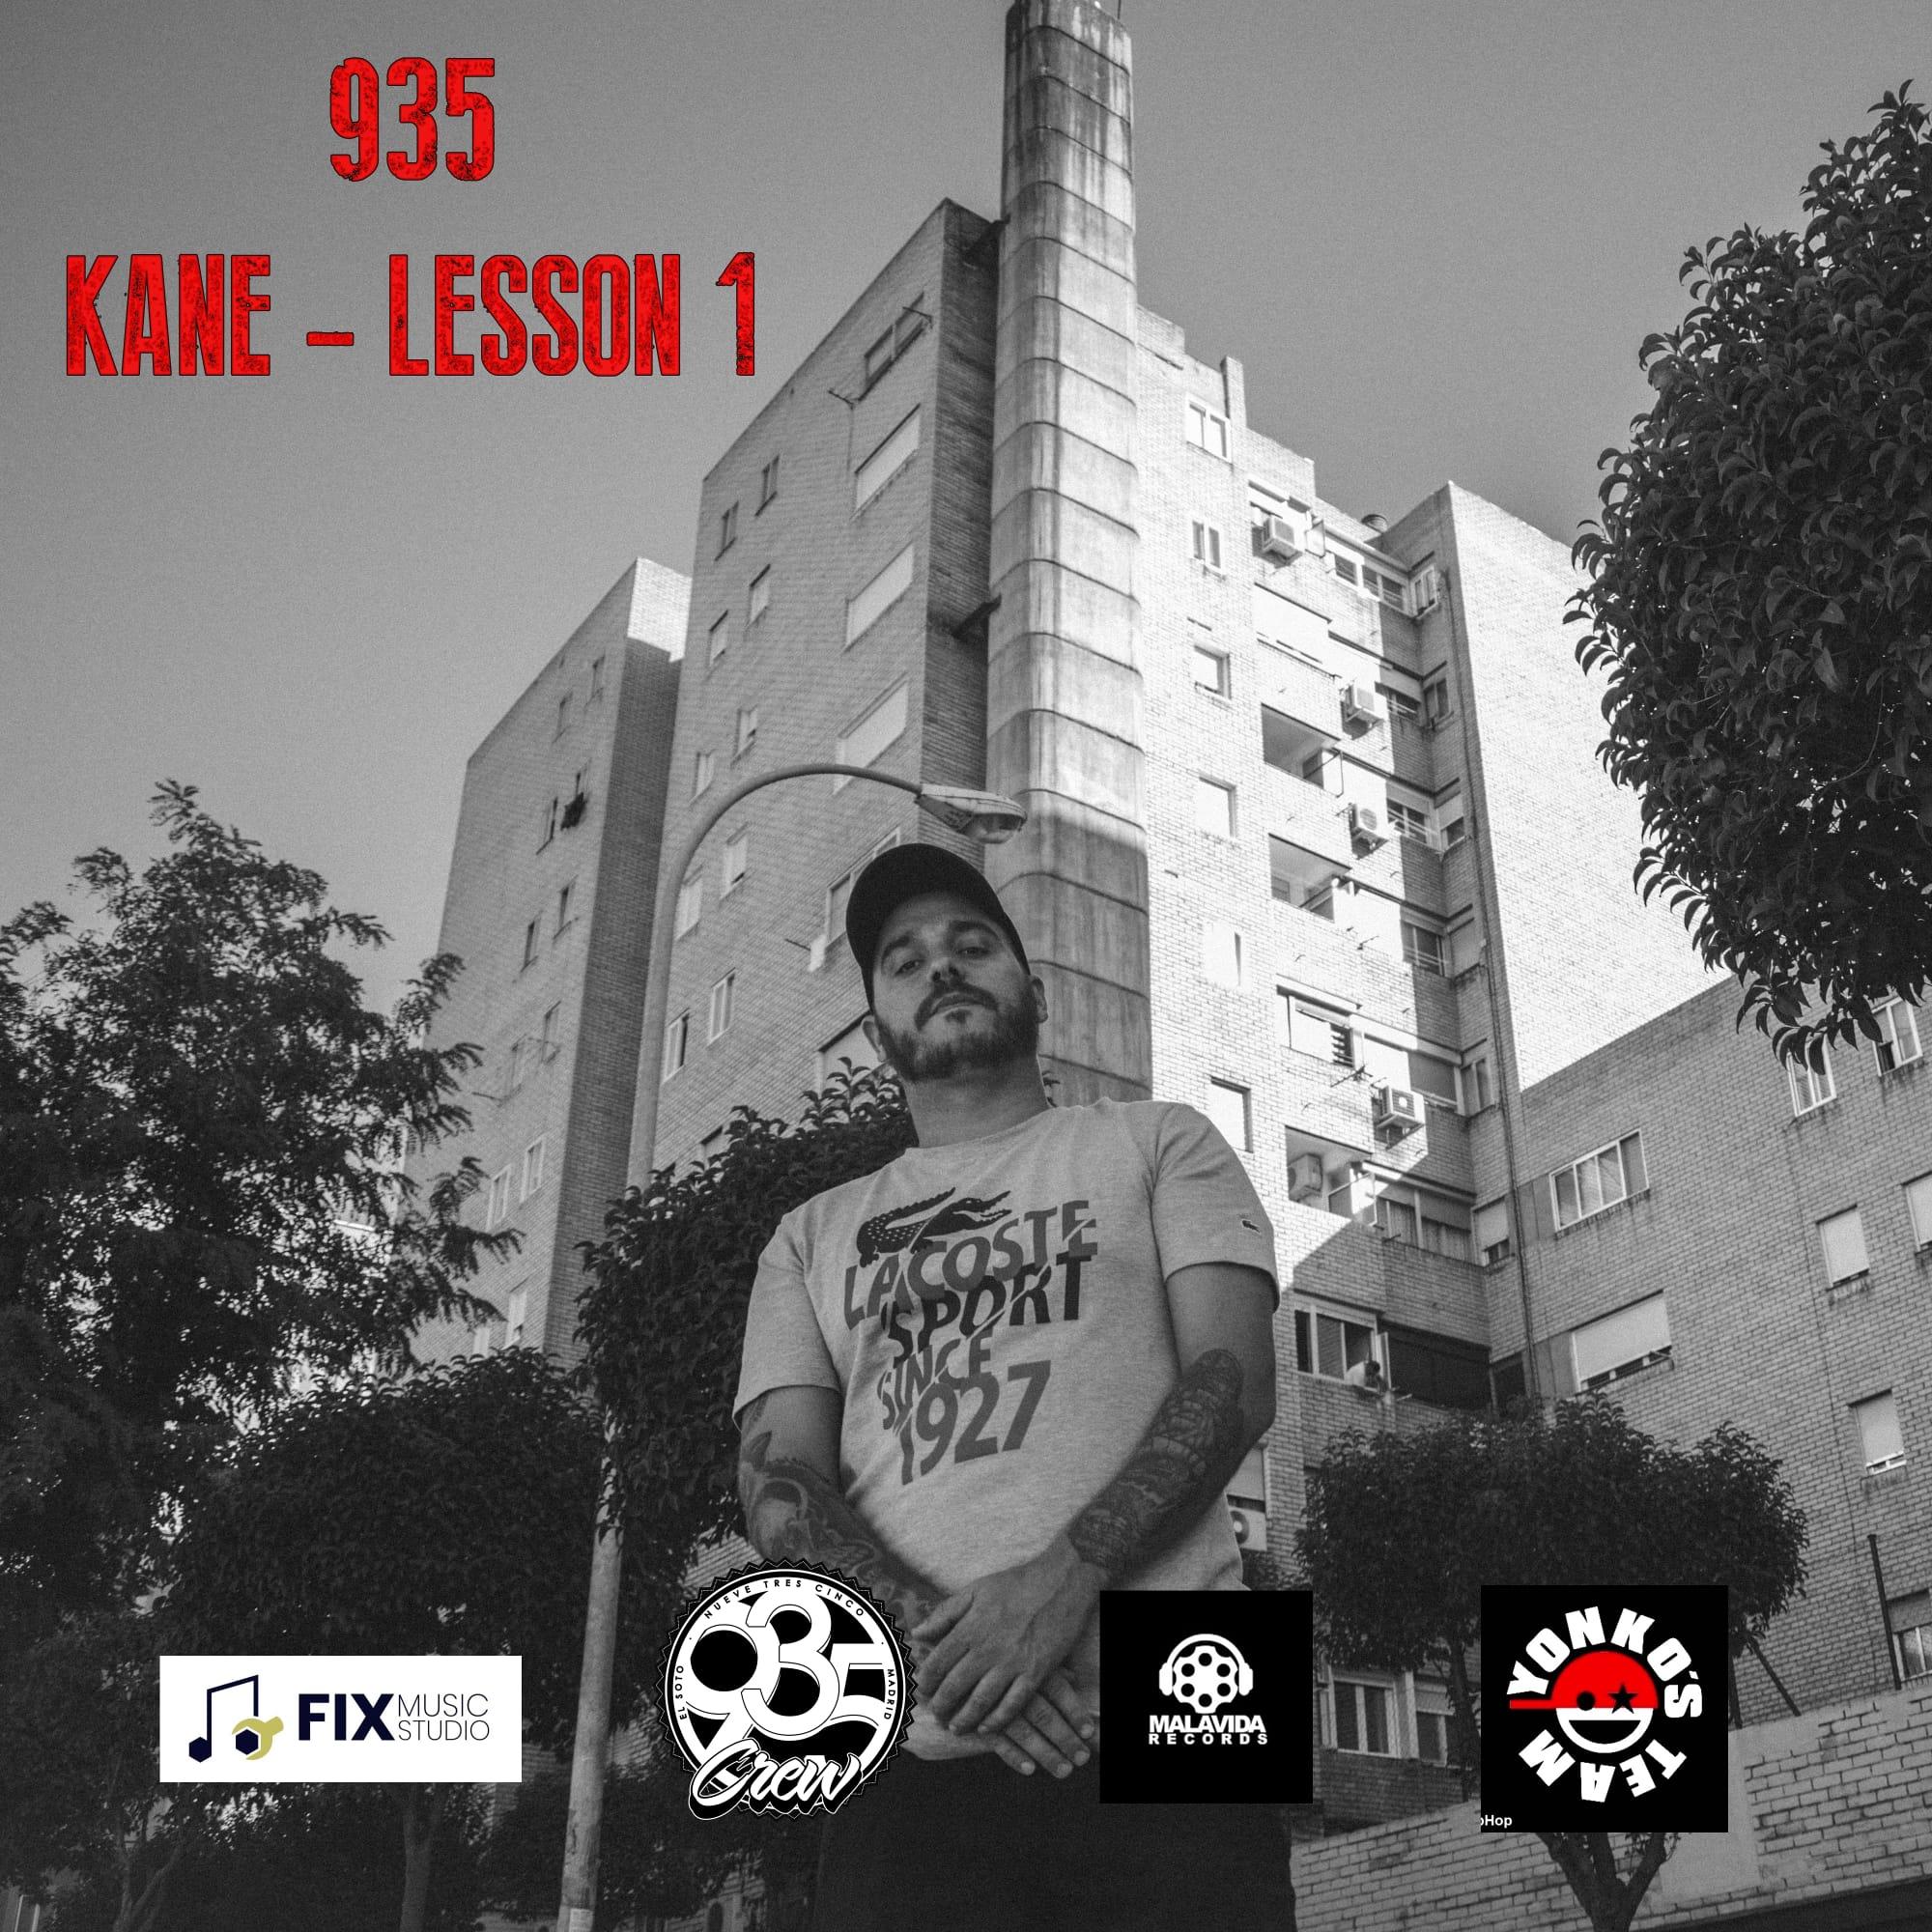 935- Lesson 1 (Kane)